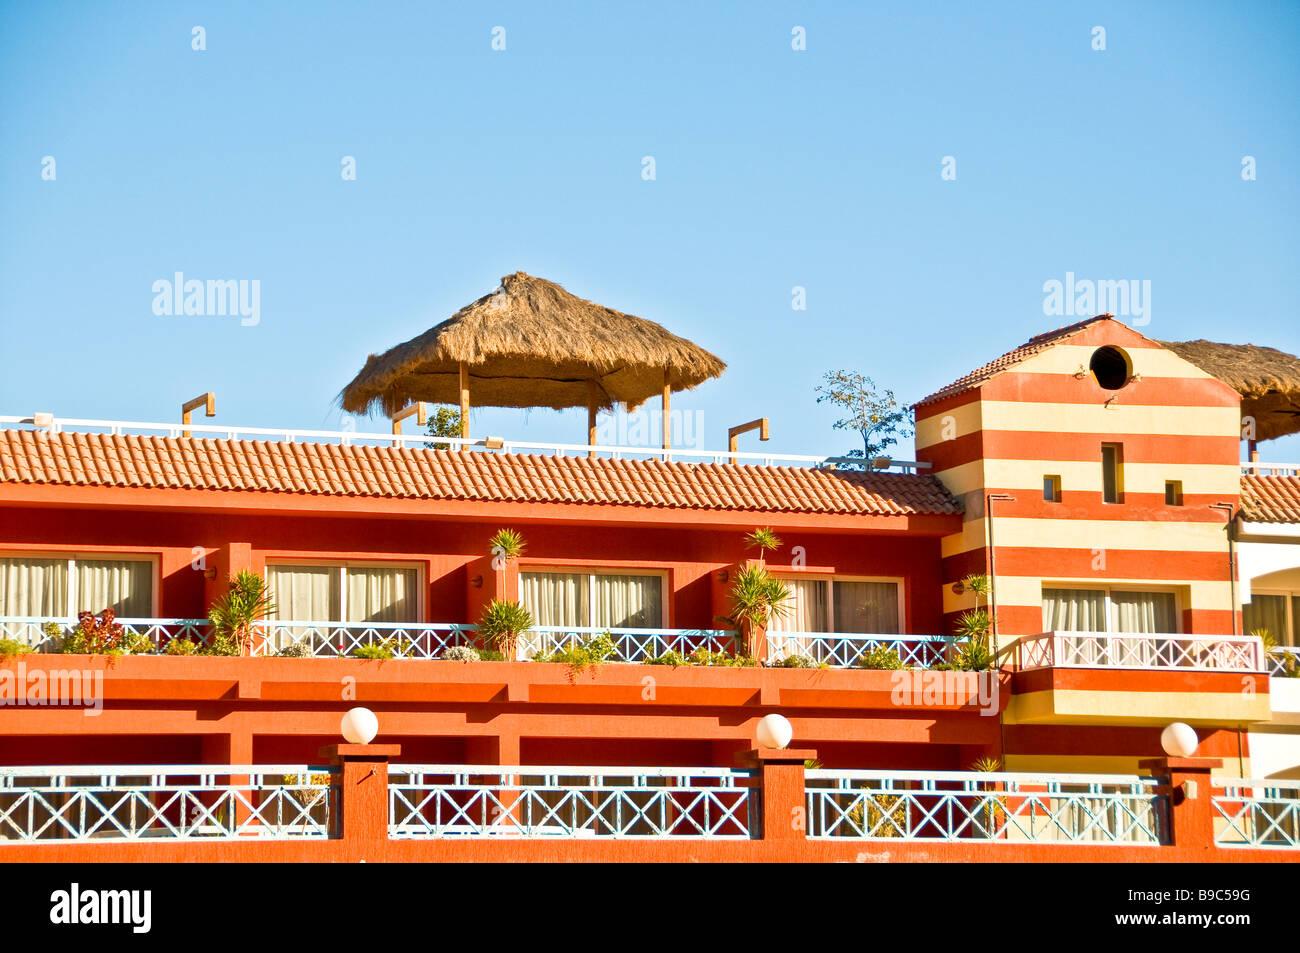 Porto Marina Resort and Spa fanrasy hotel building architecture bright colors red Egypt Mediterranean North Coast - Stock Image